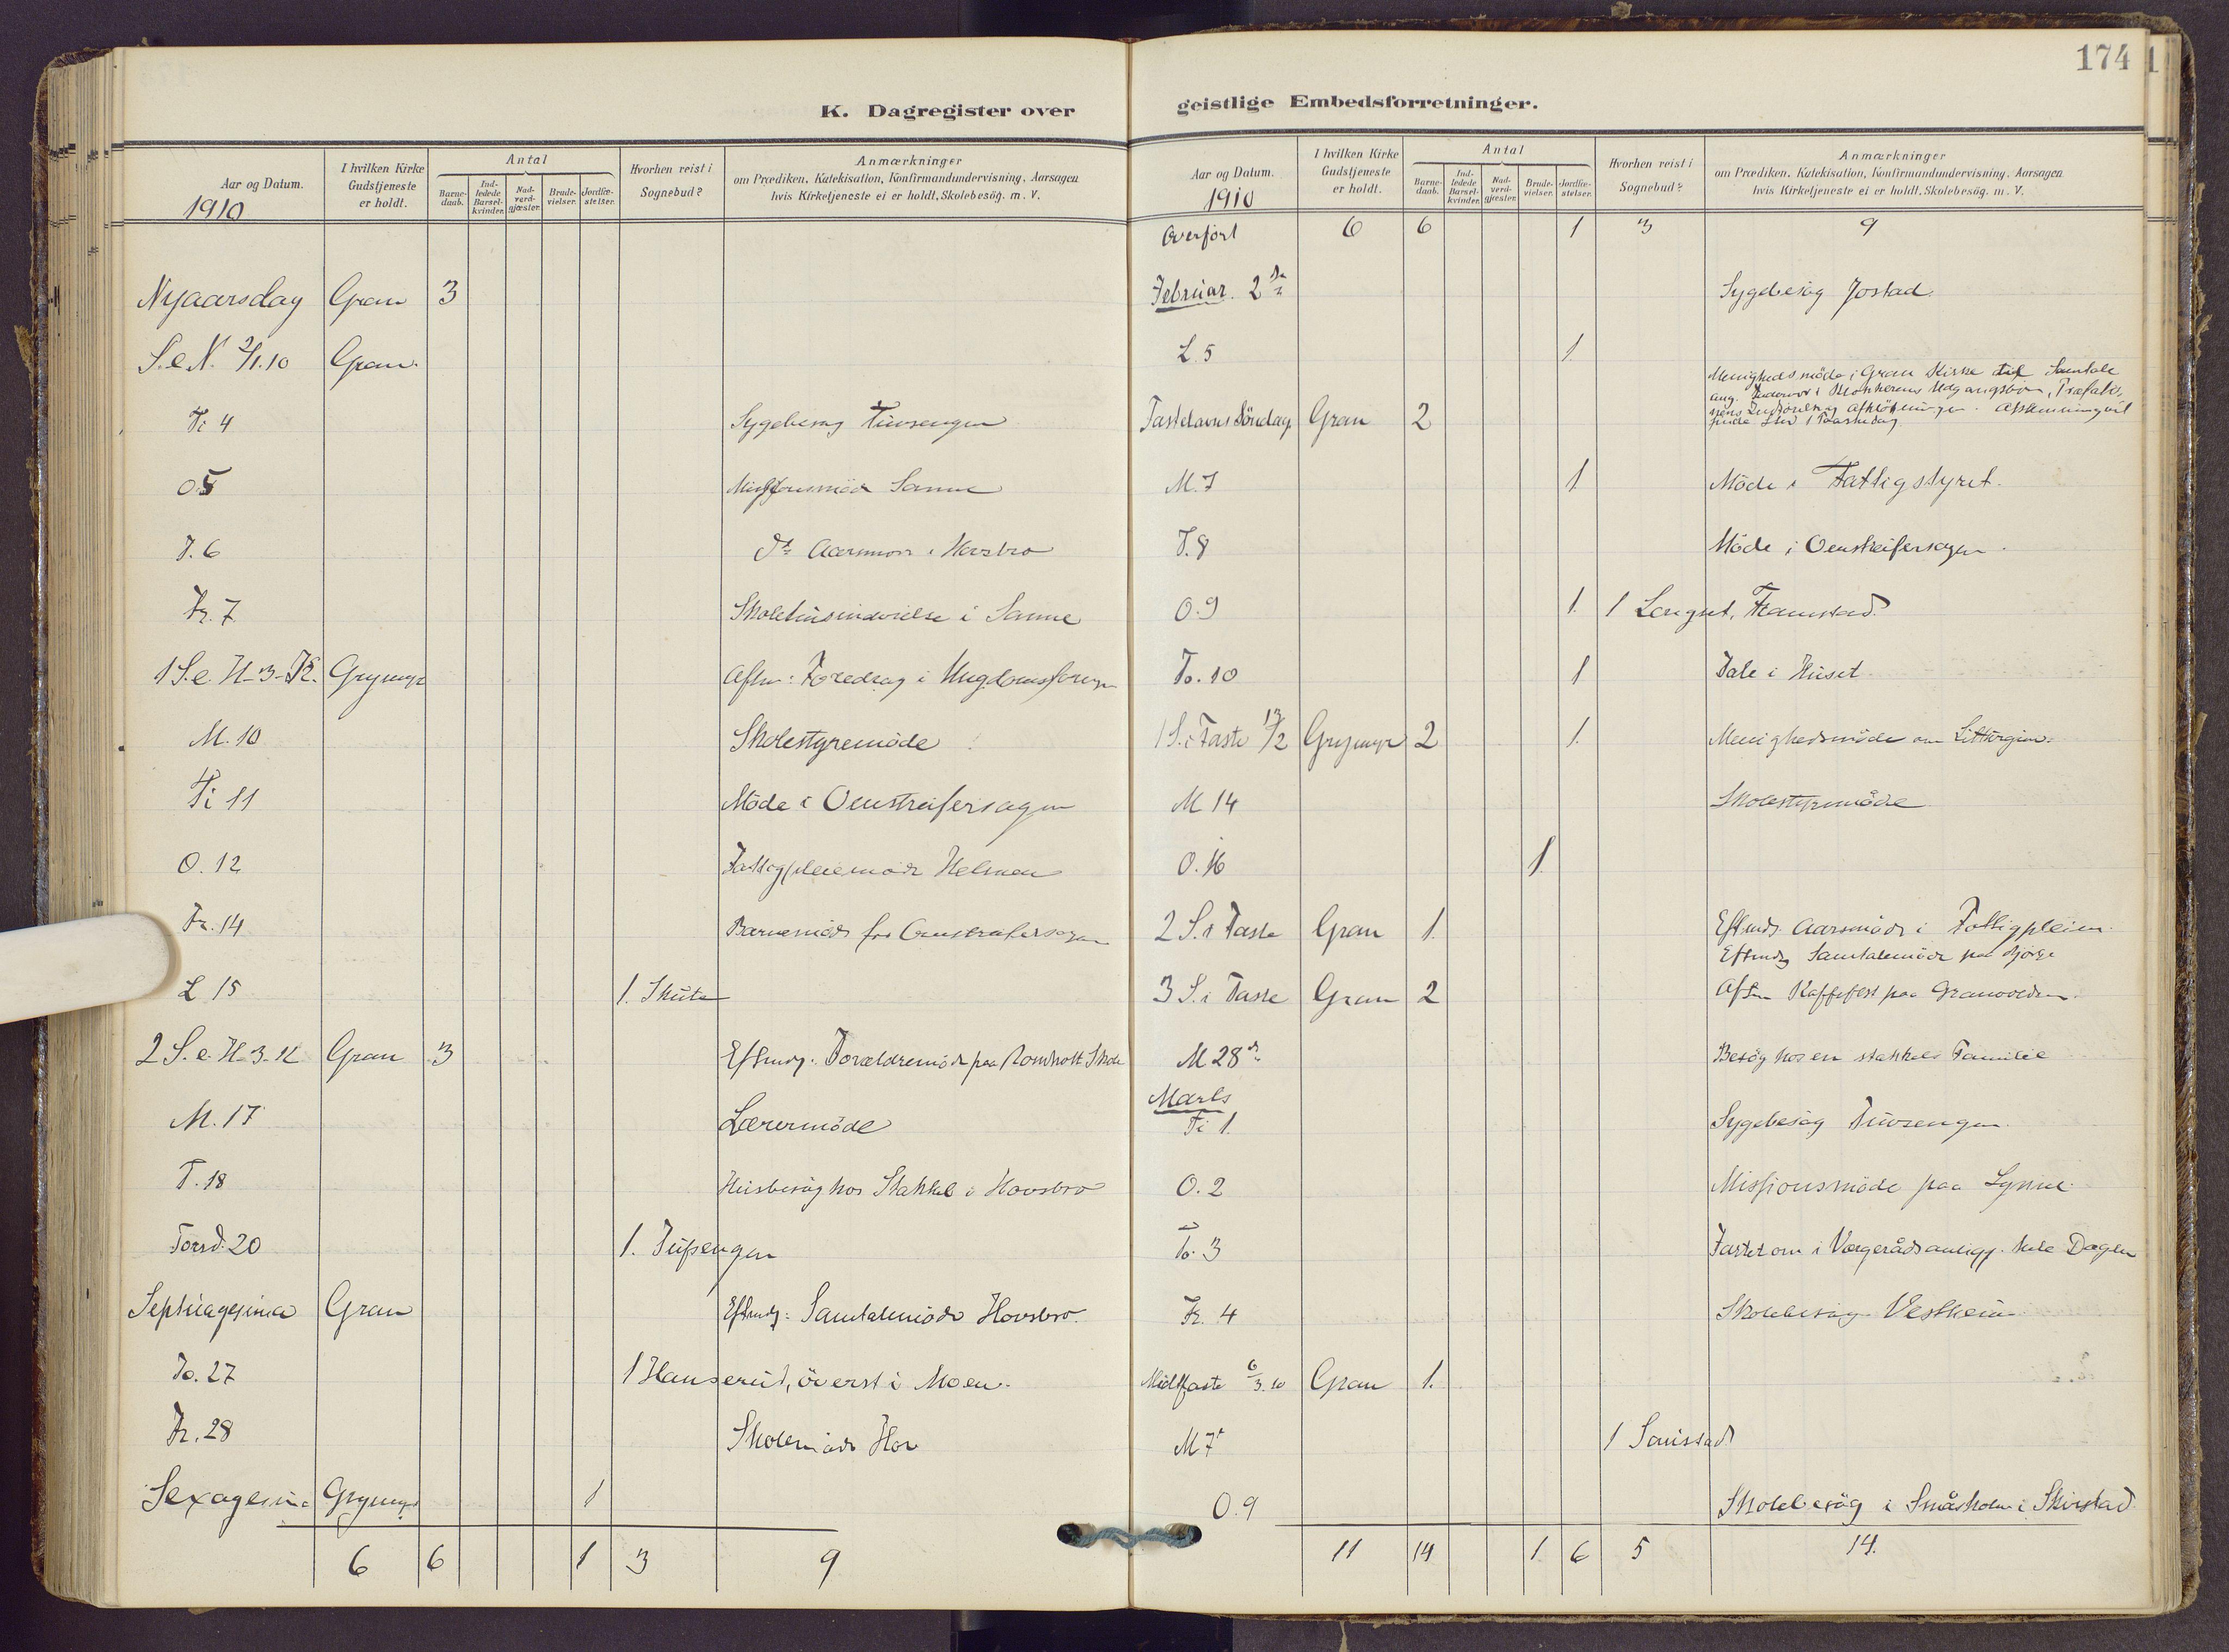 SAH, Gran prestekontor, Ministerialbok nr. 22, 1908-1918, s. 174